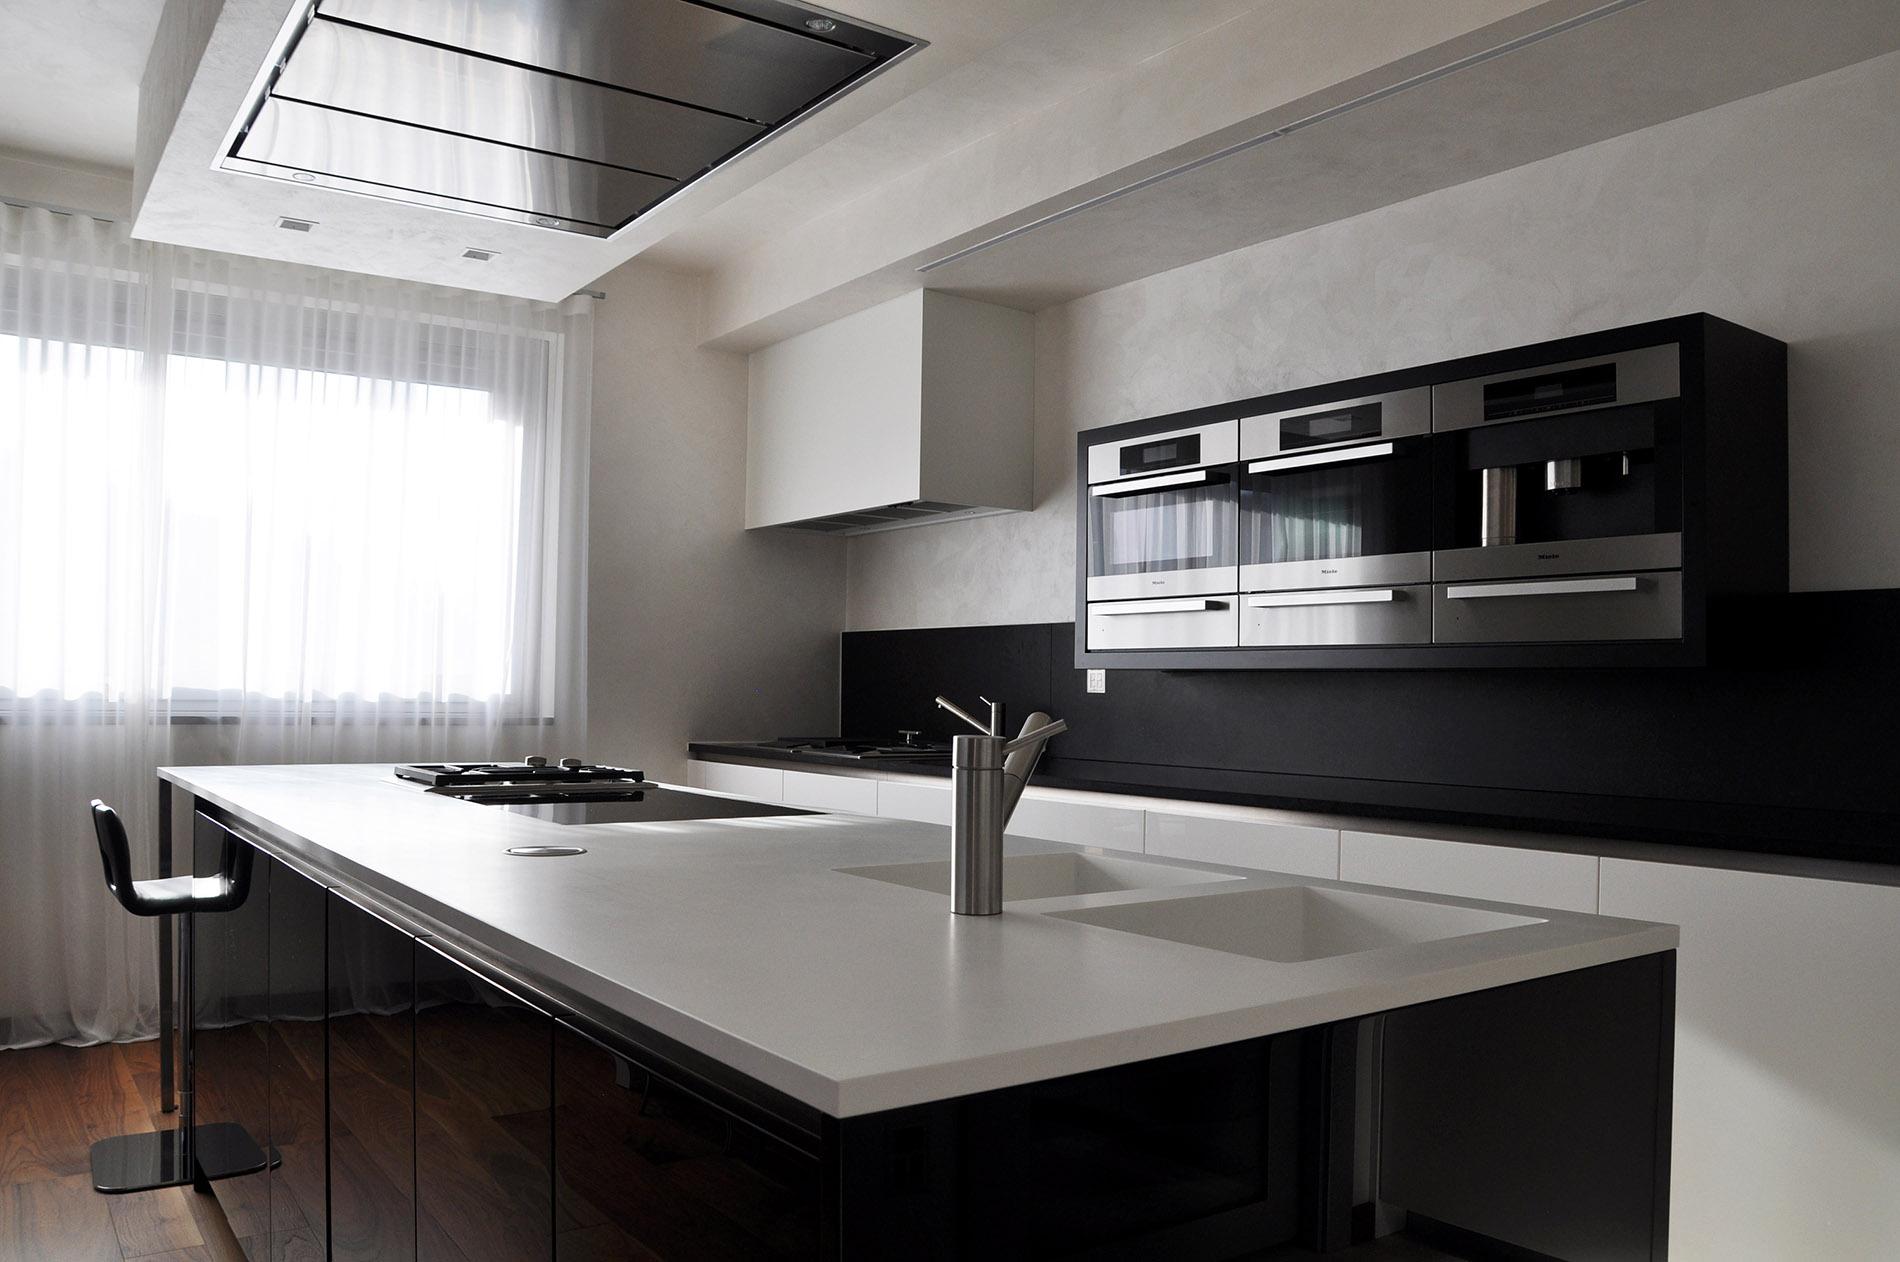 Style antico, Servizi, Mg Imbianchino Bergamo, finitura per interni, cucina